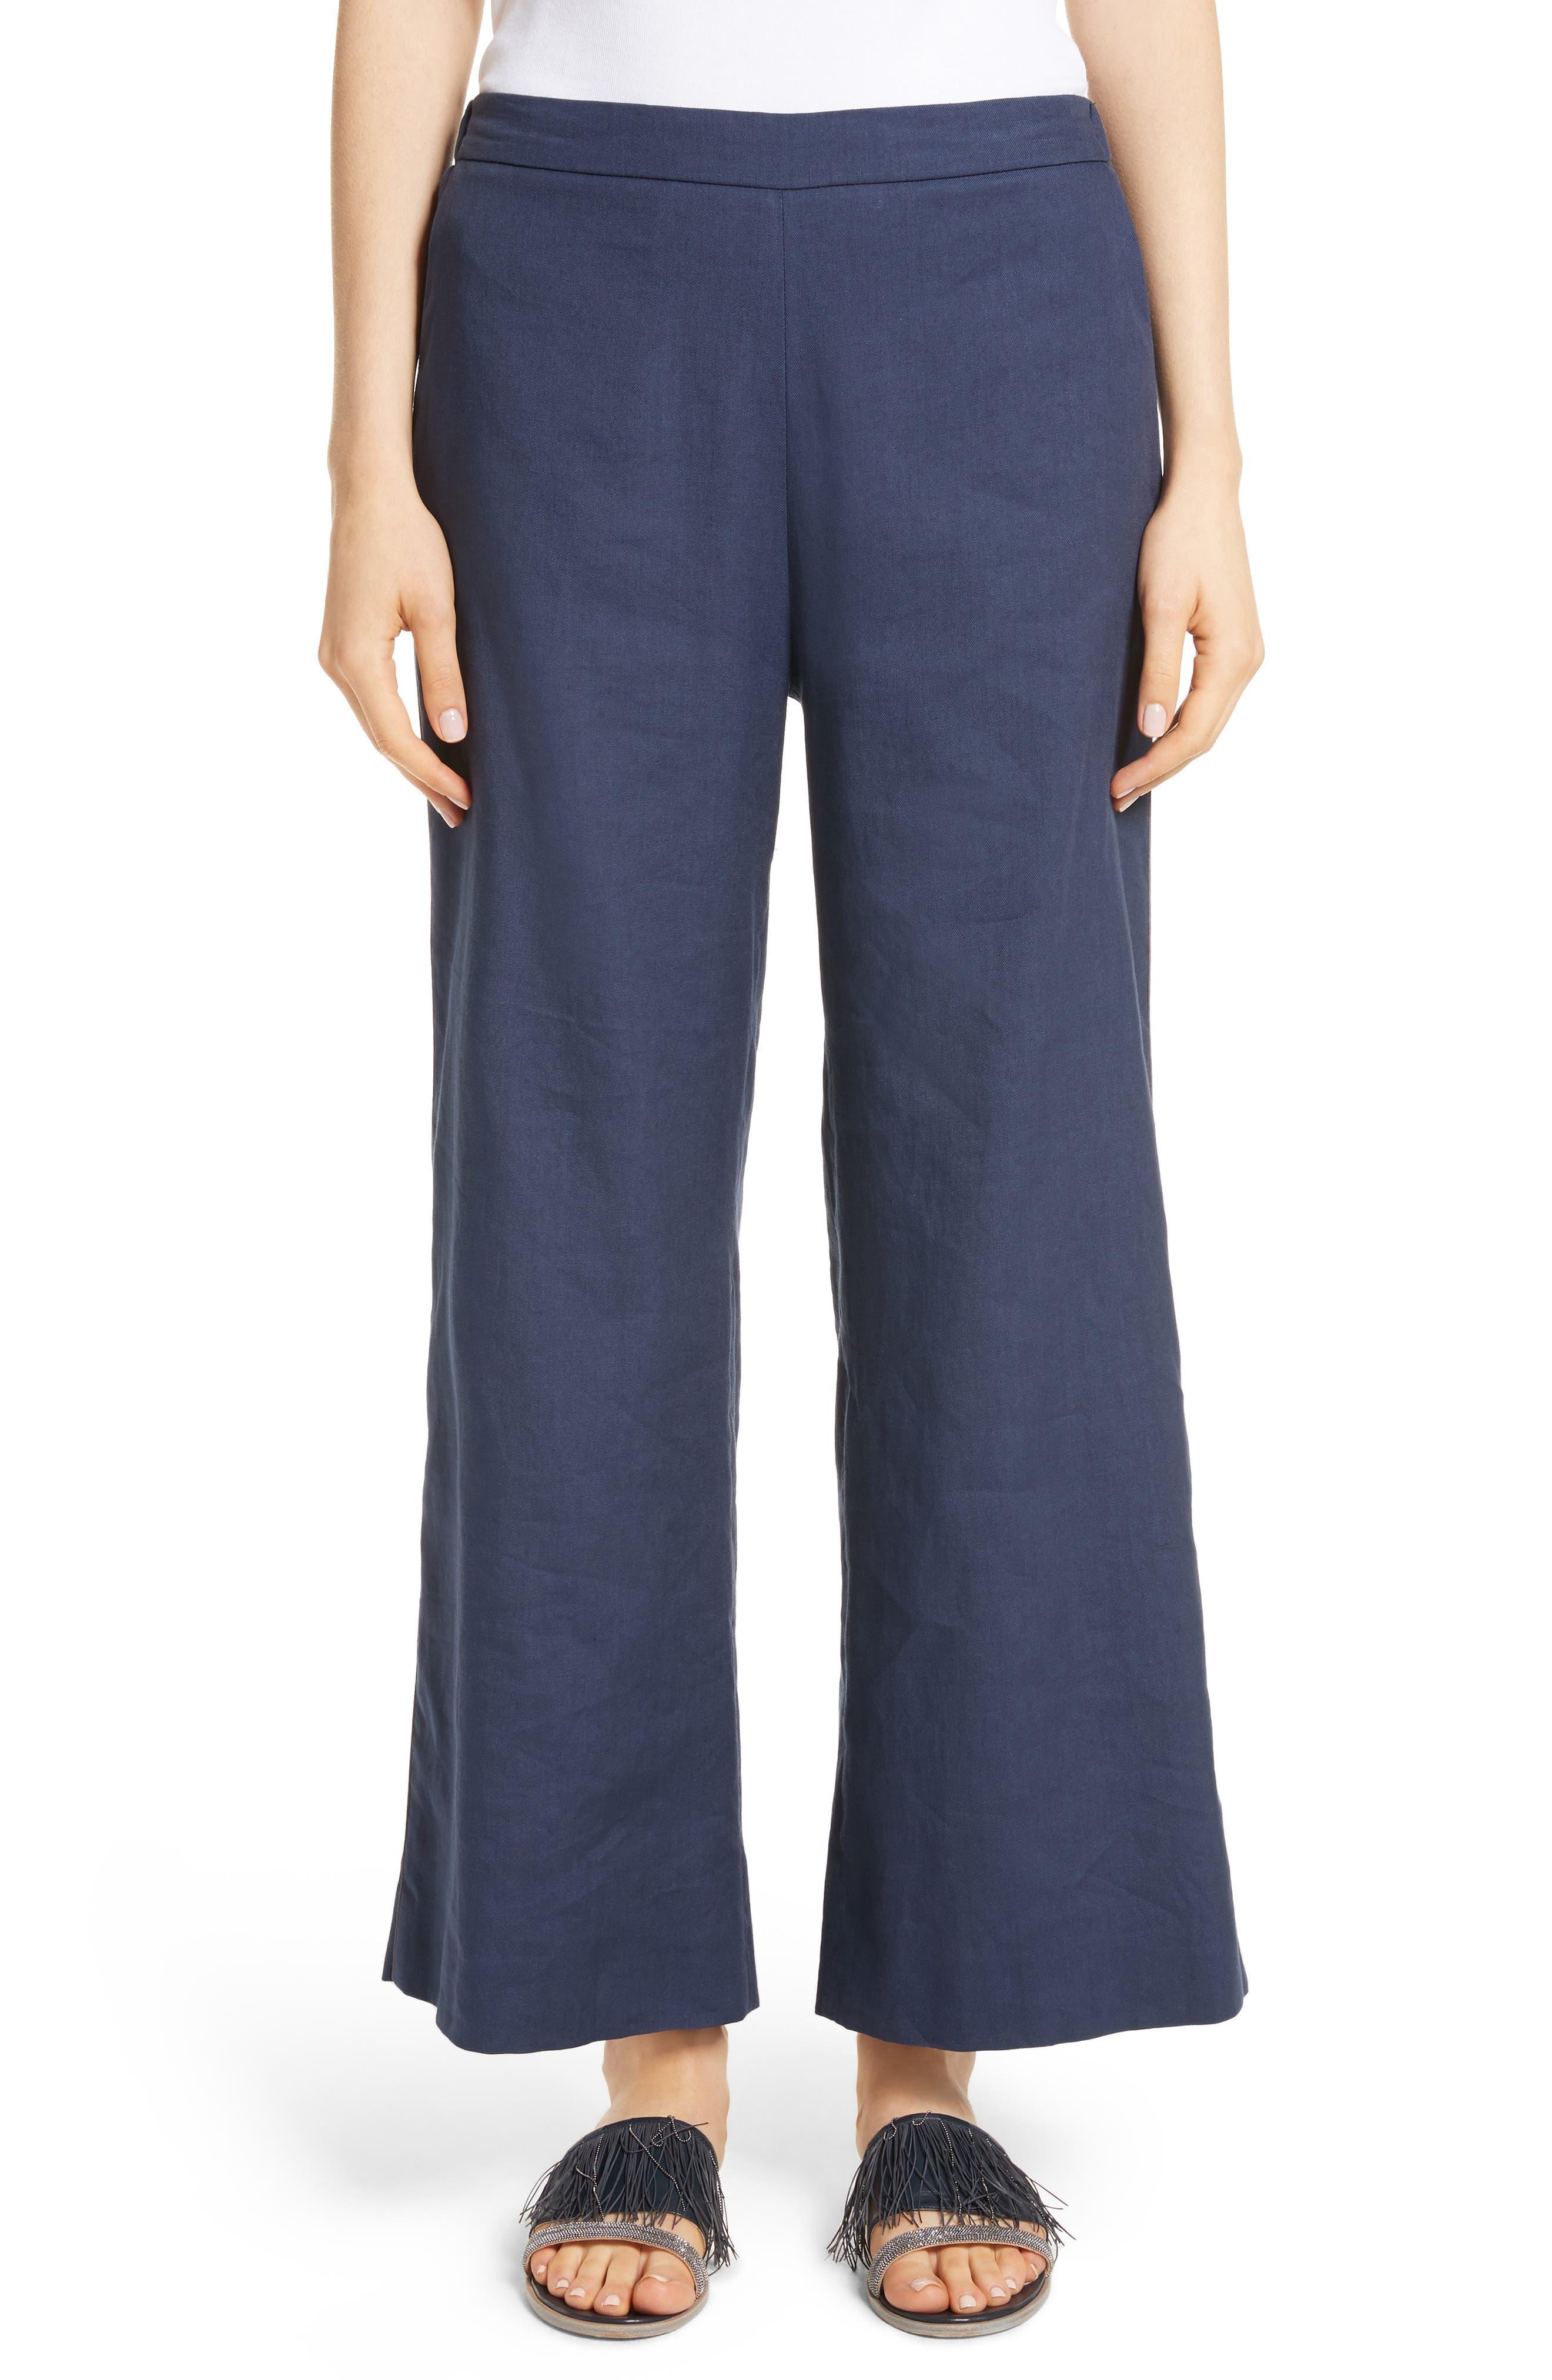 Fabiana Filippi Linen Blend Wide Leg Crop Pants